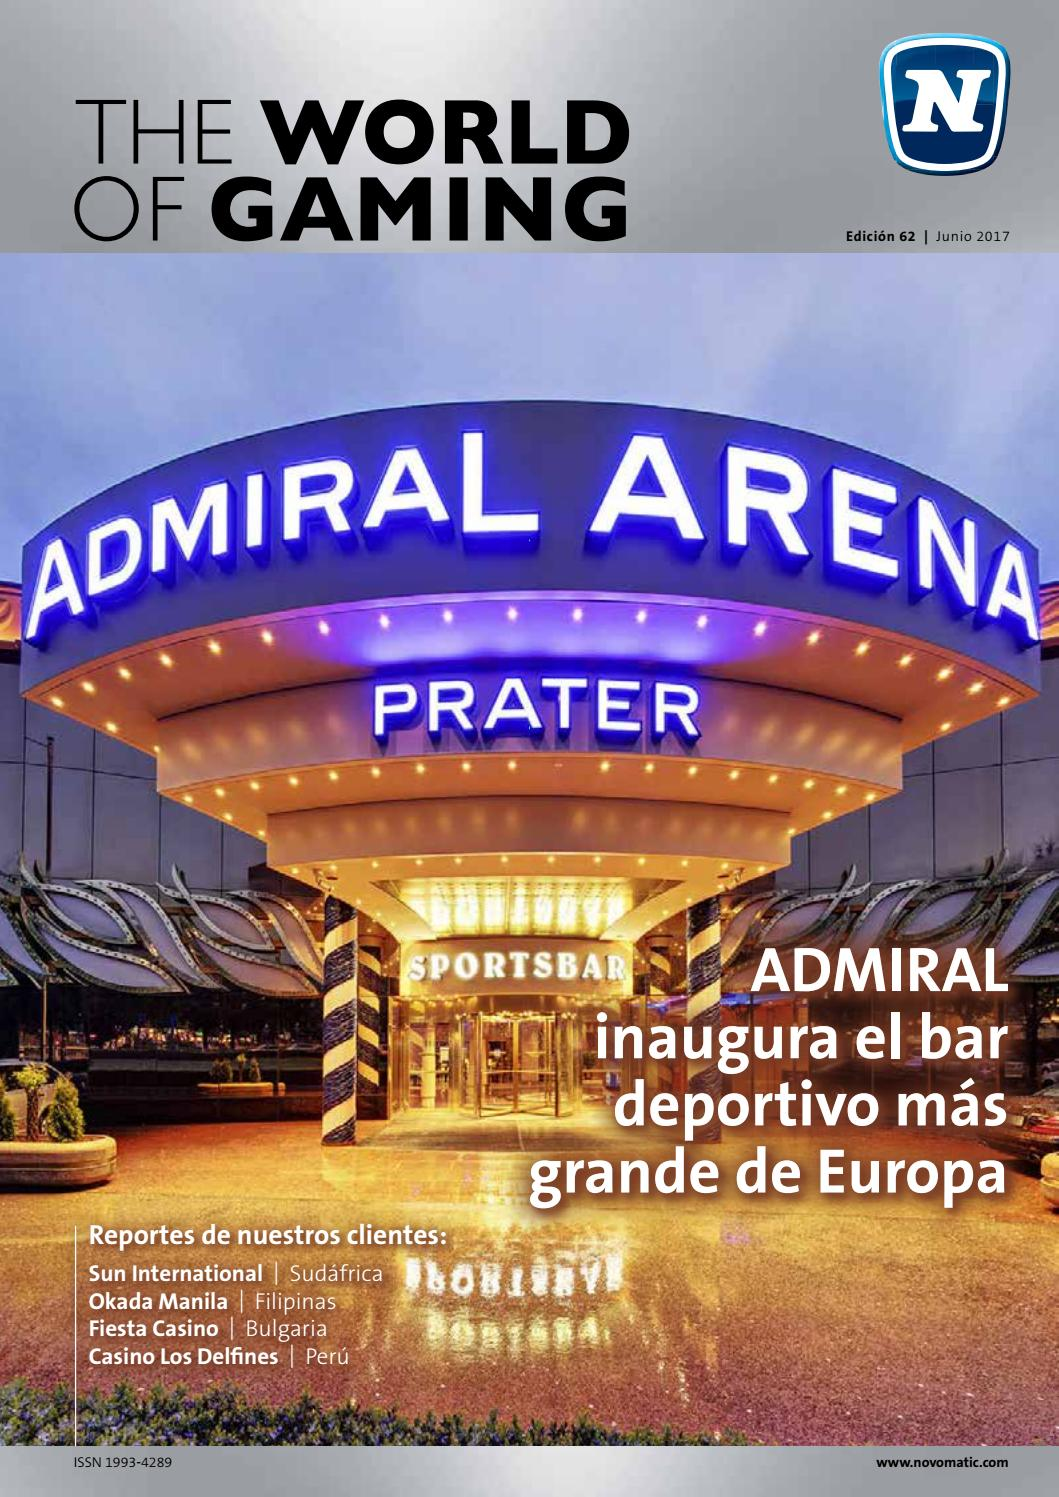 Casino fiesta alajuela agenda james bond casino royale game pc